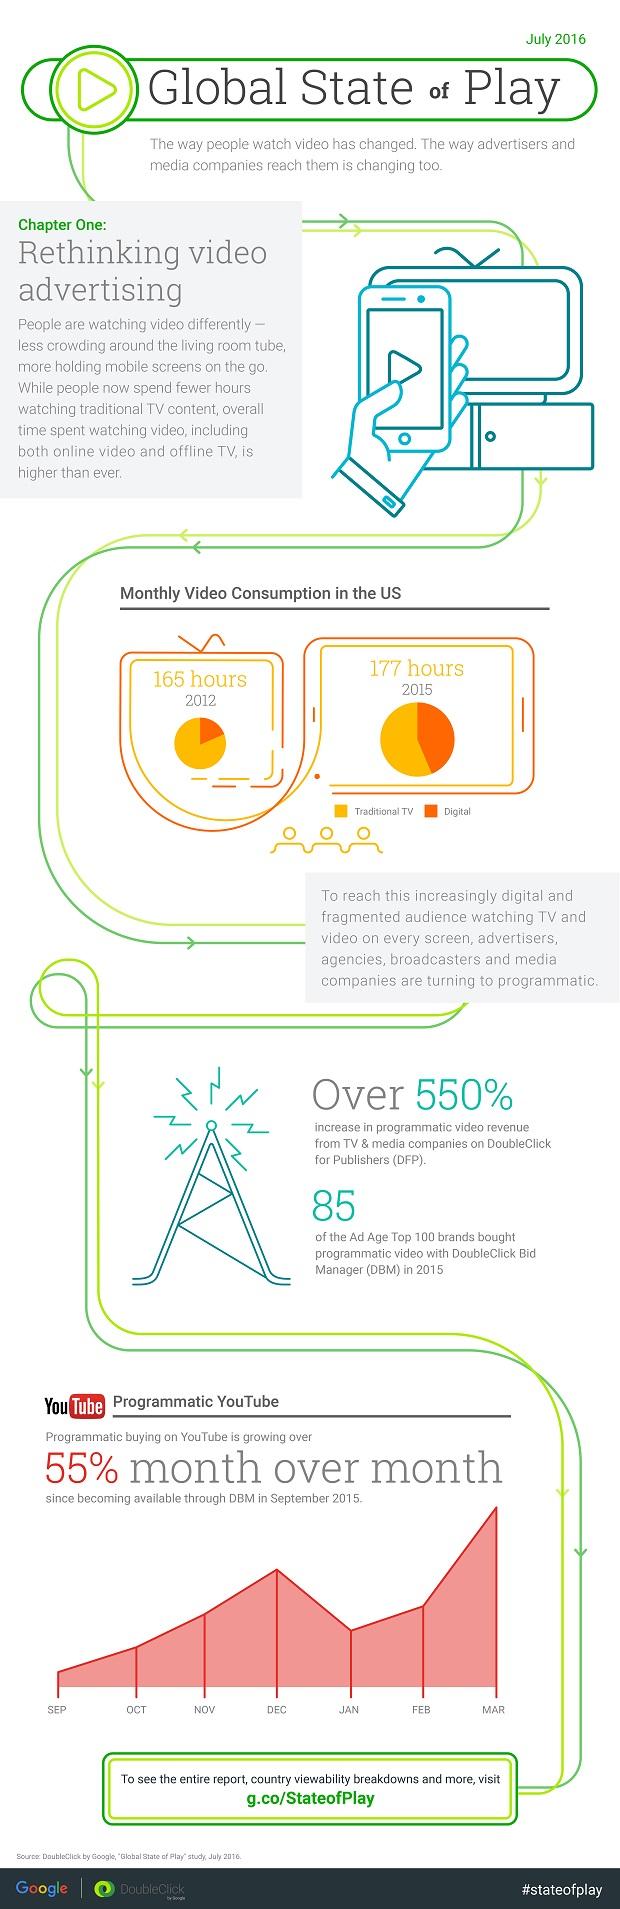 StateofPlay-VideoInsights-Infographic-Ch1.jpg